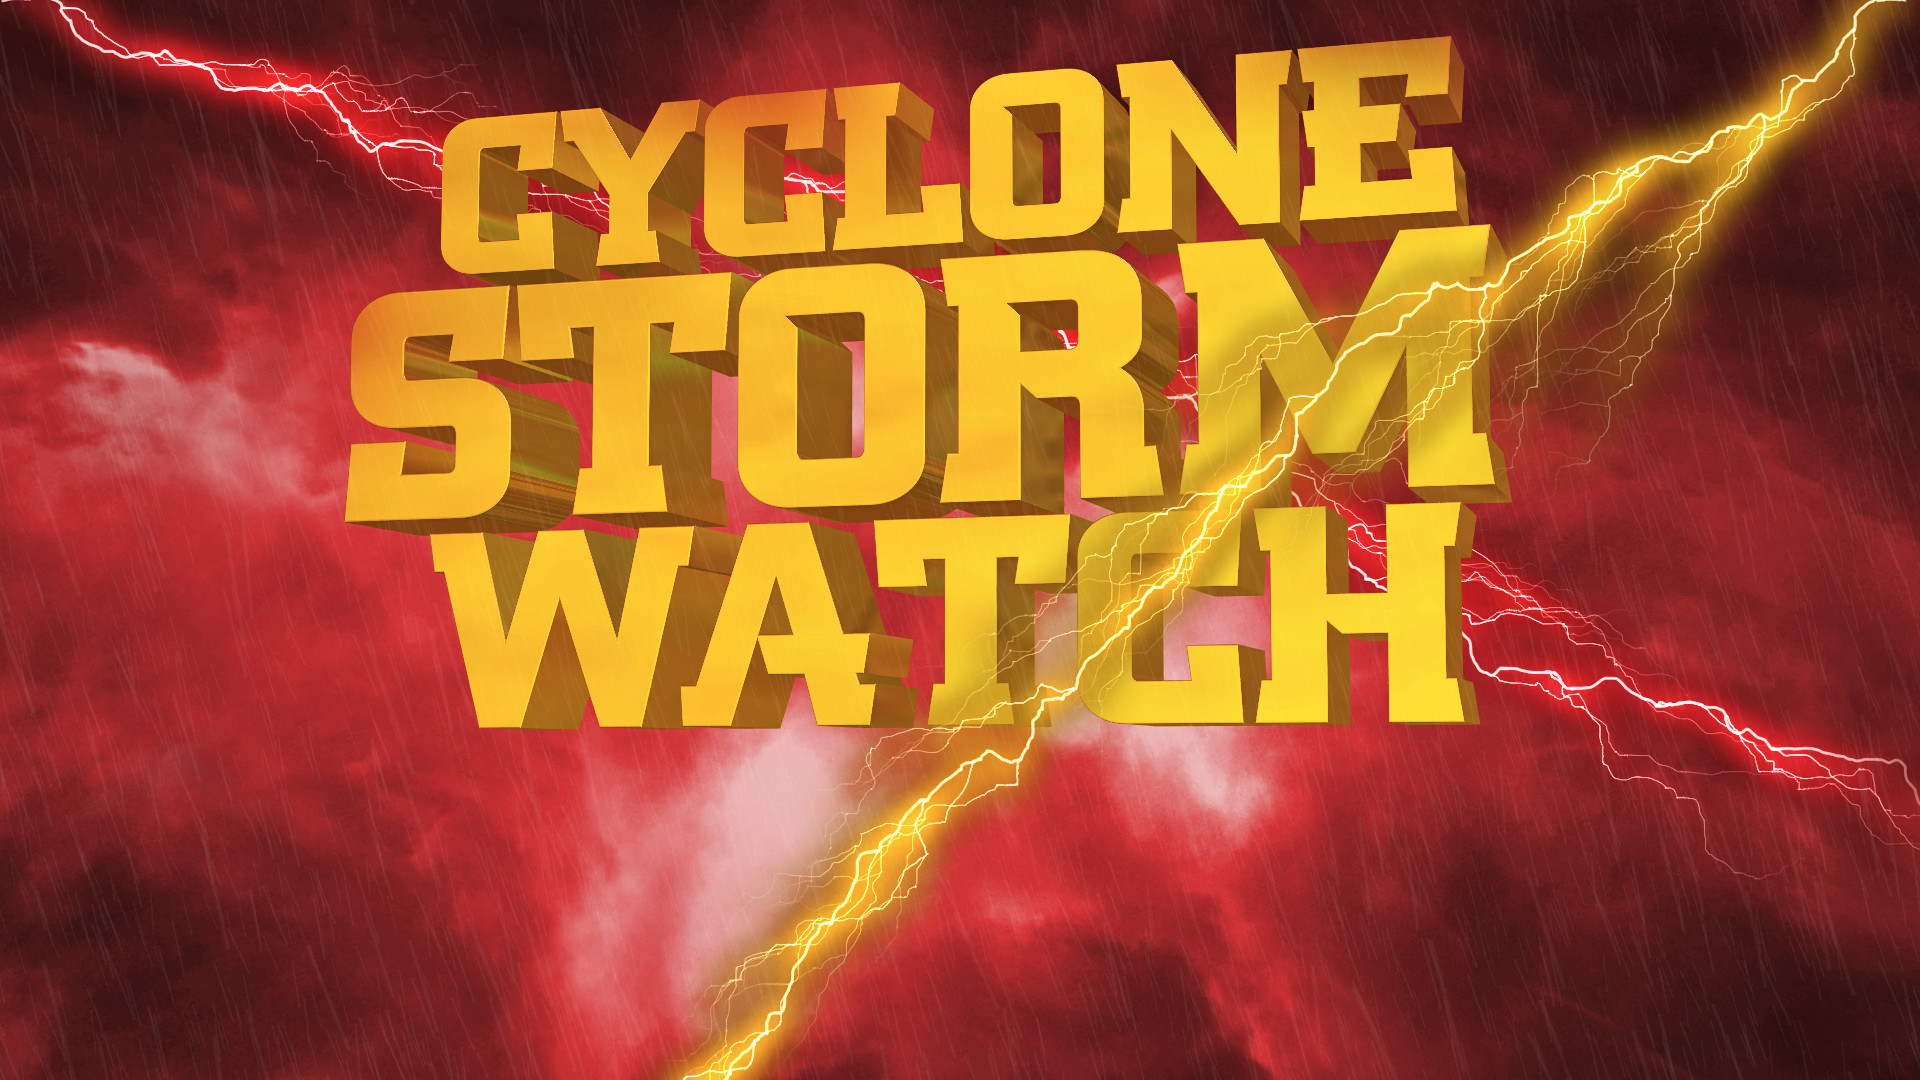 Cyclone Storm Watch Feb. 23rd